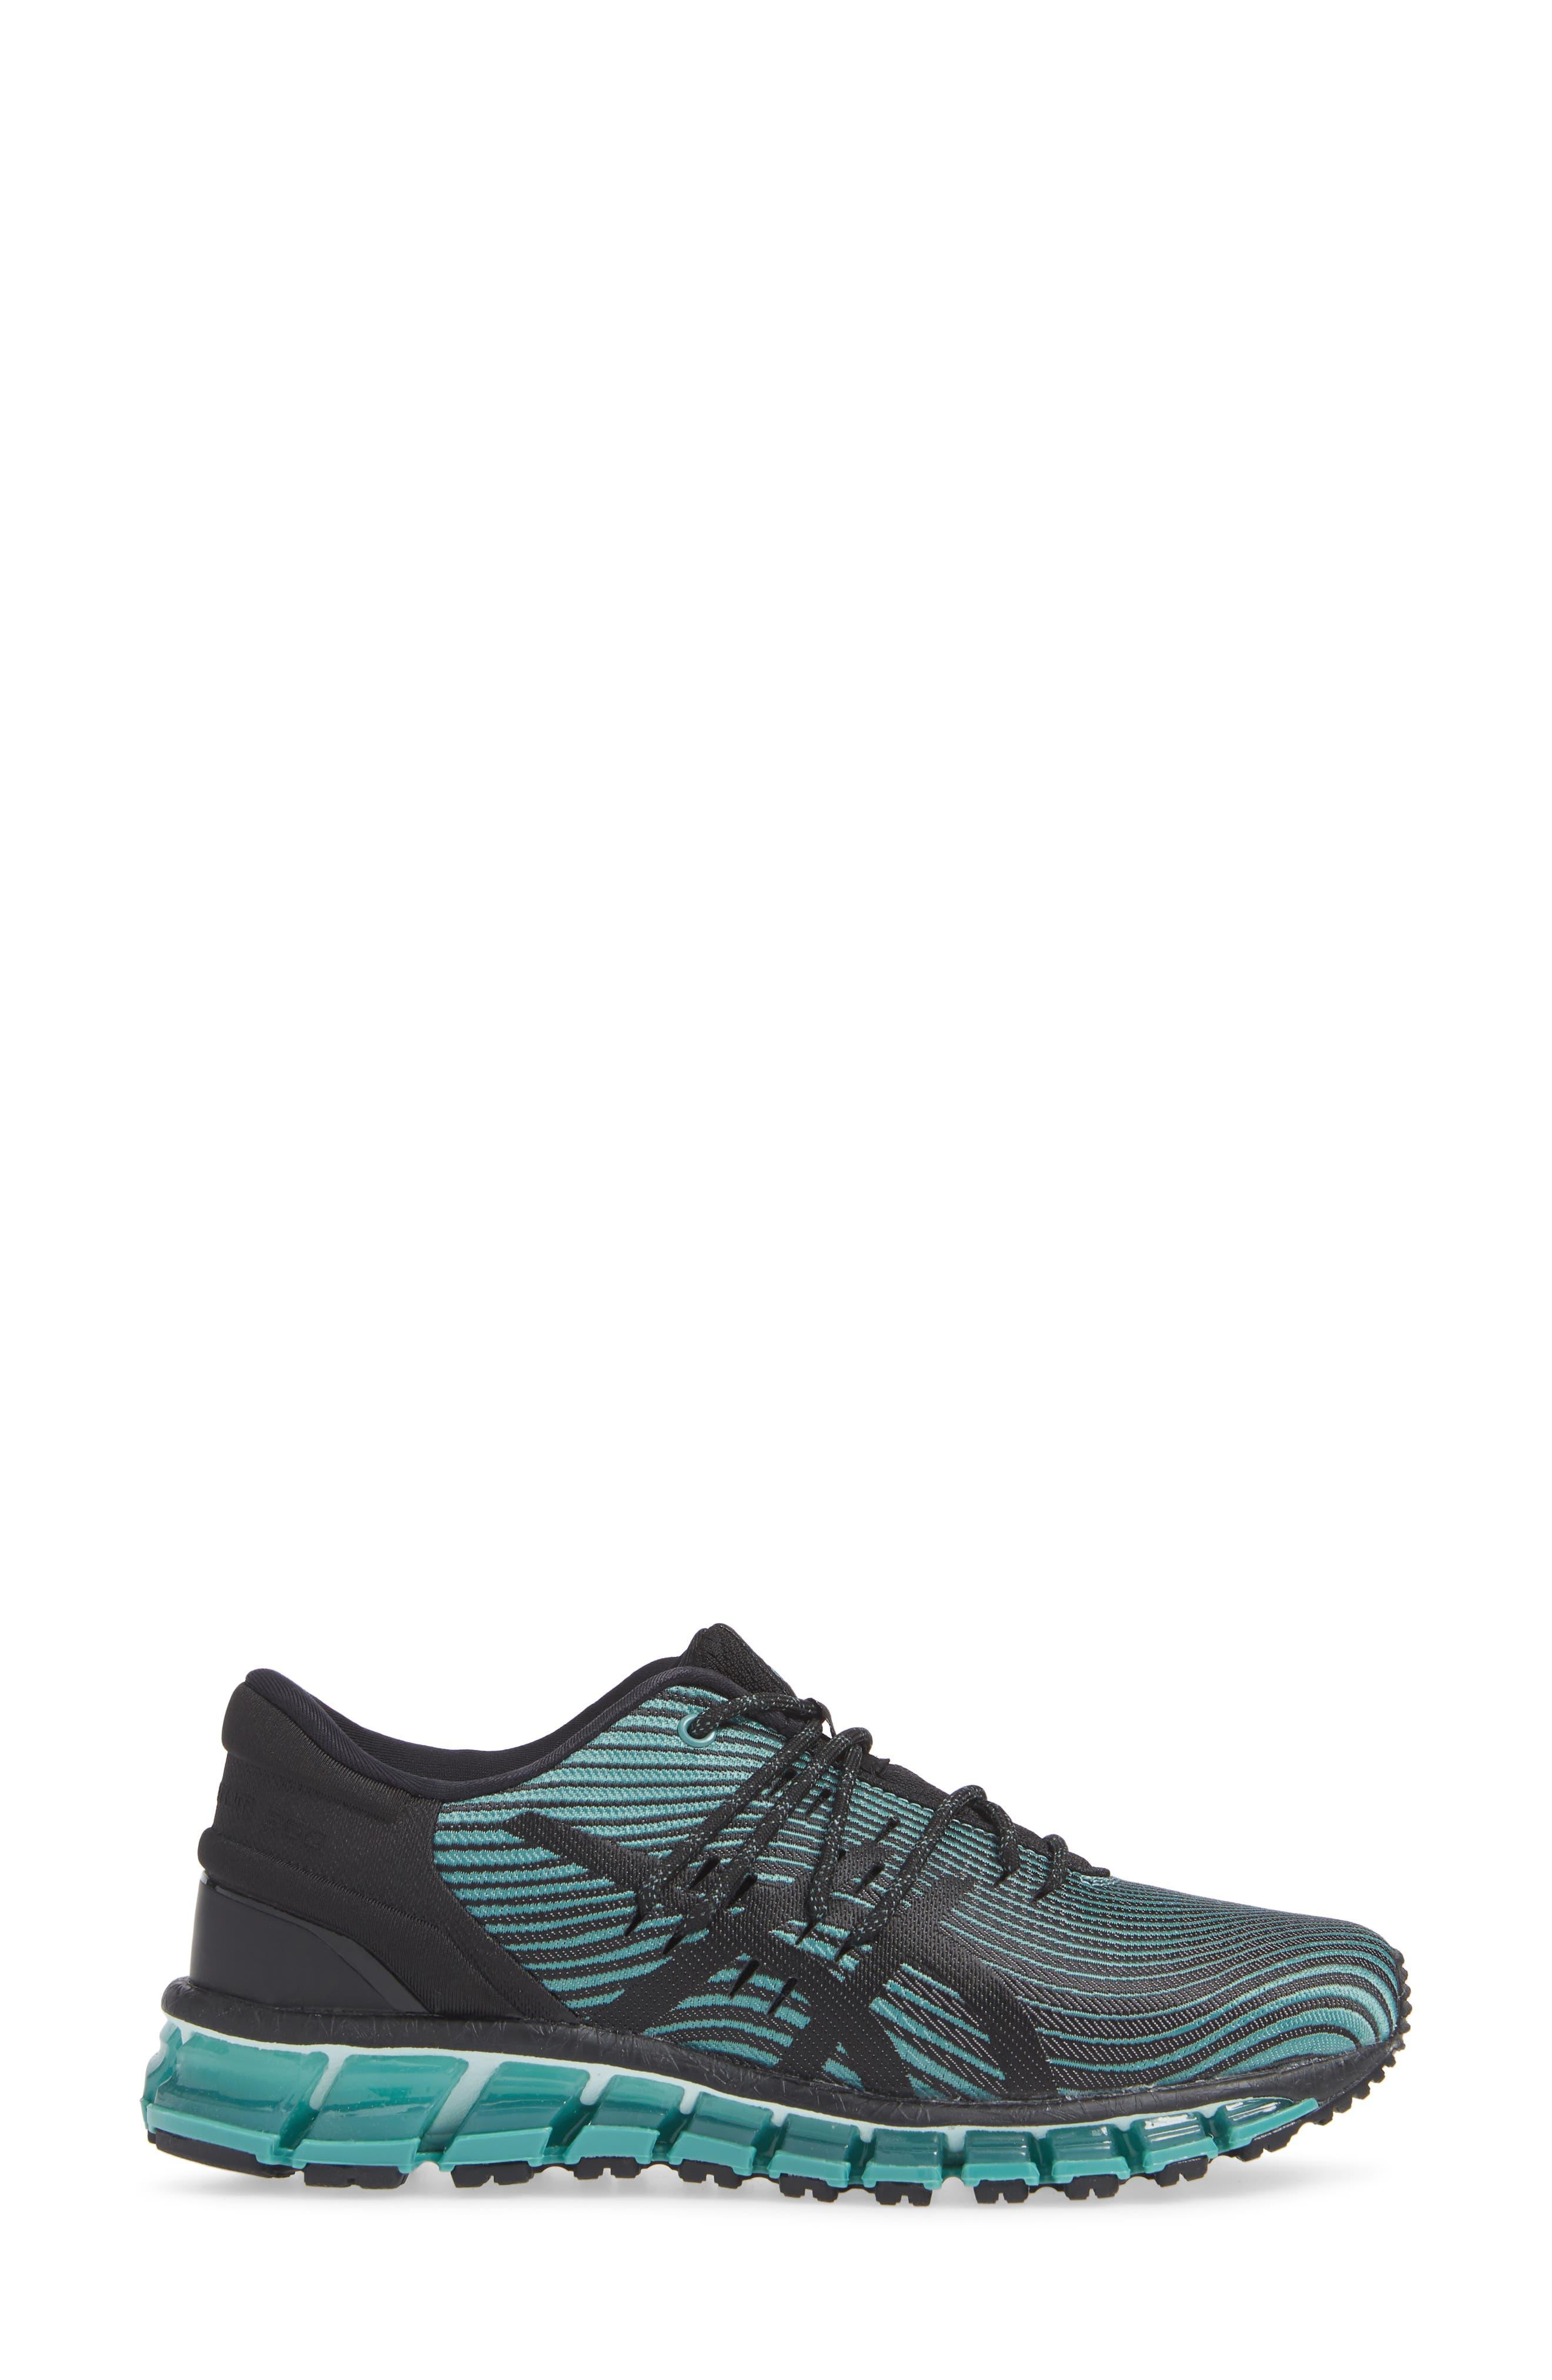 GEL Quantum 360 4 Running Shoe,                             Alternate thumbnail 3, color,                             SAGE/ BLACK